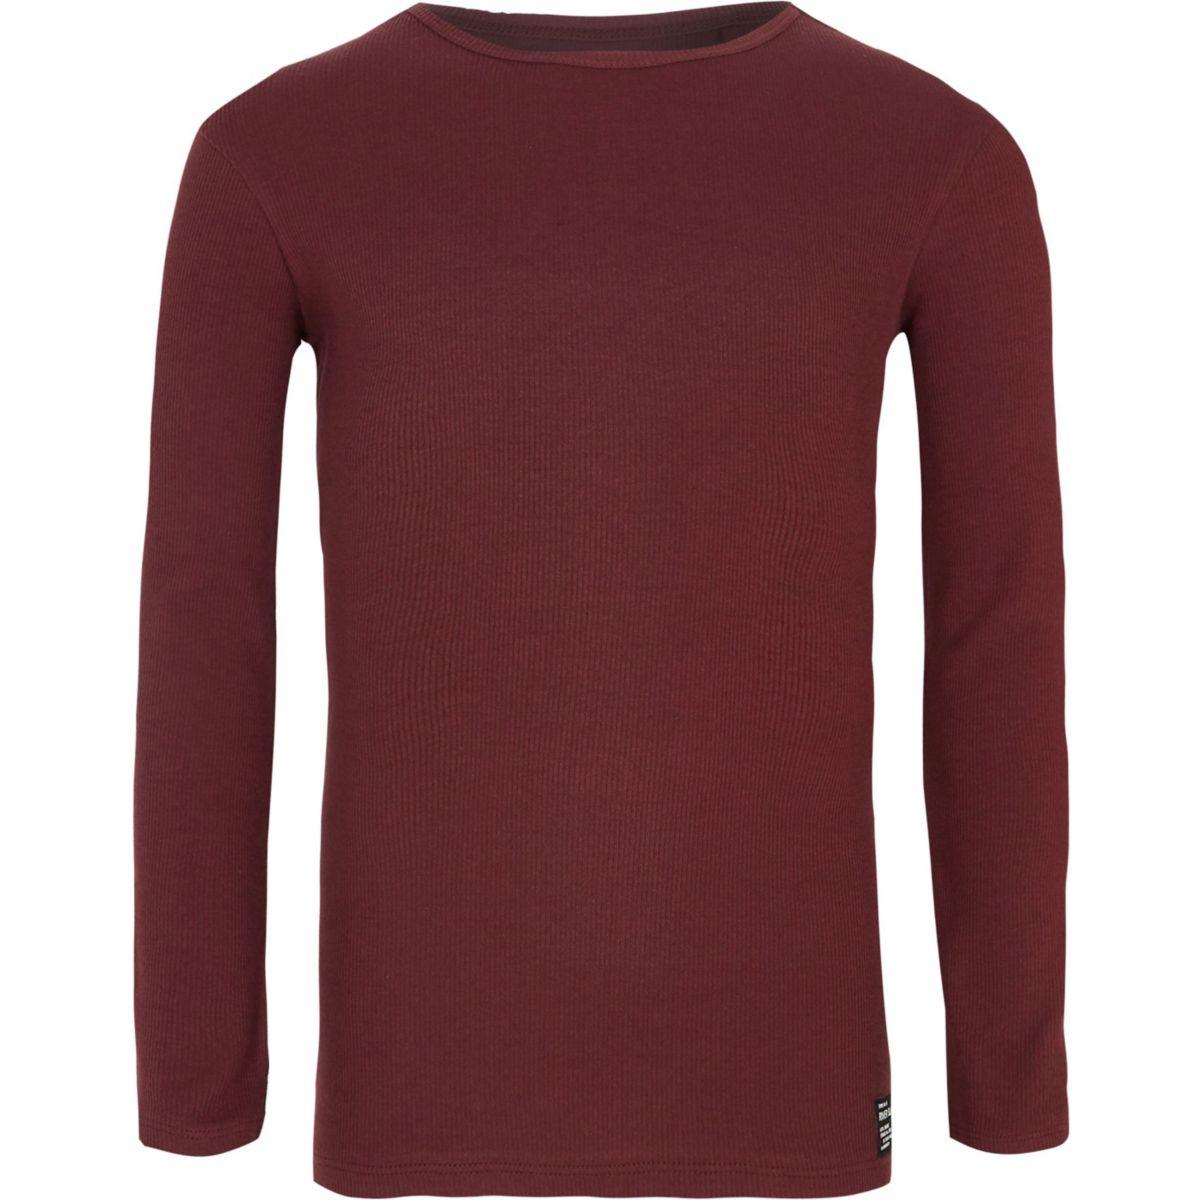 Boys dark red ribbed long sleeve t shirt long sleeve t for Ribbed long sleeve shirt